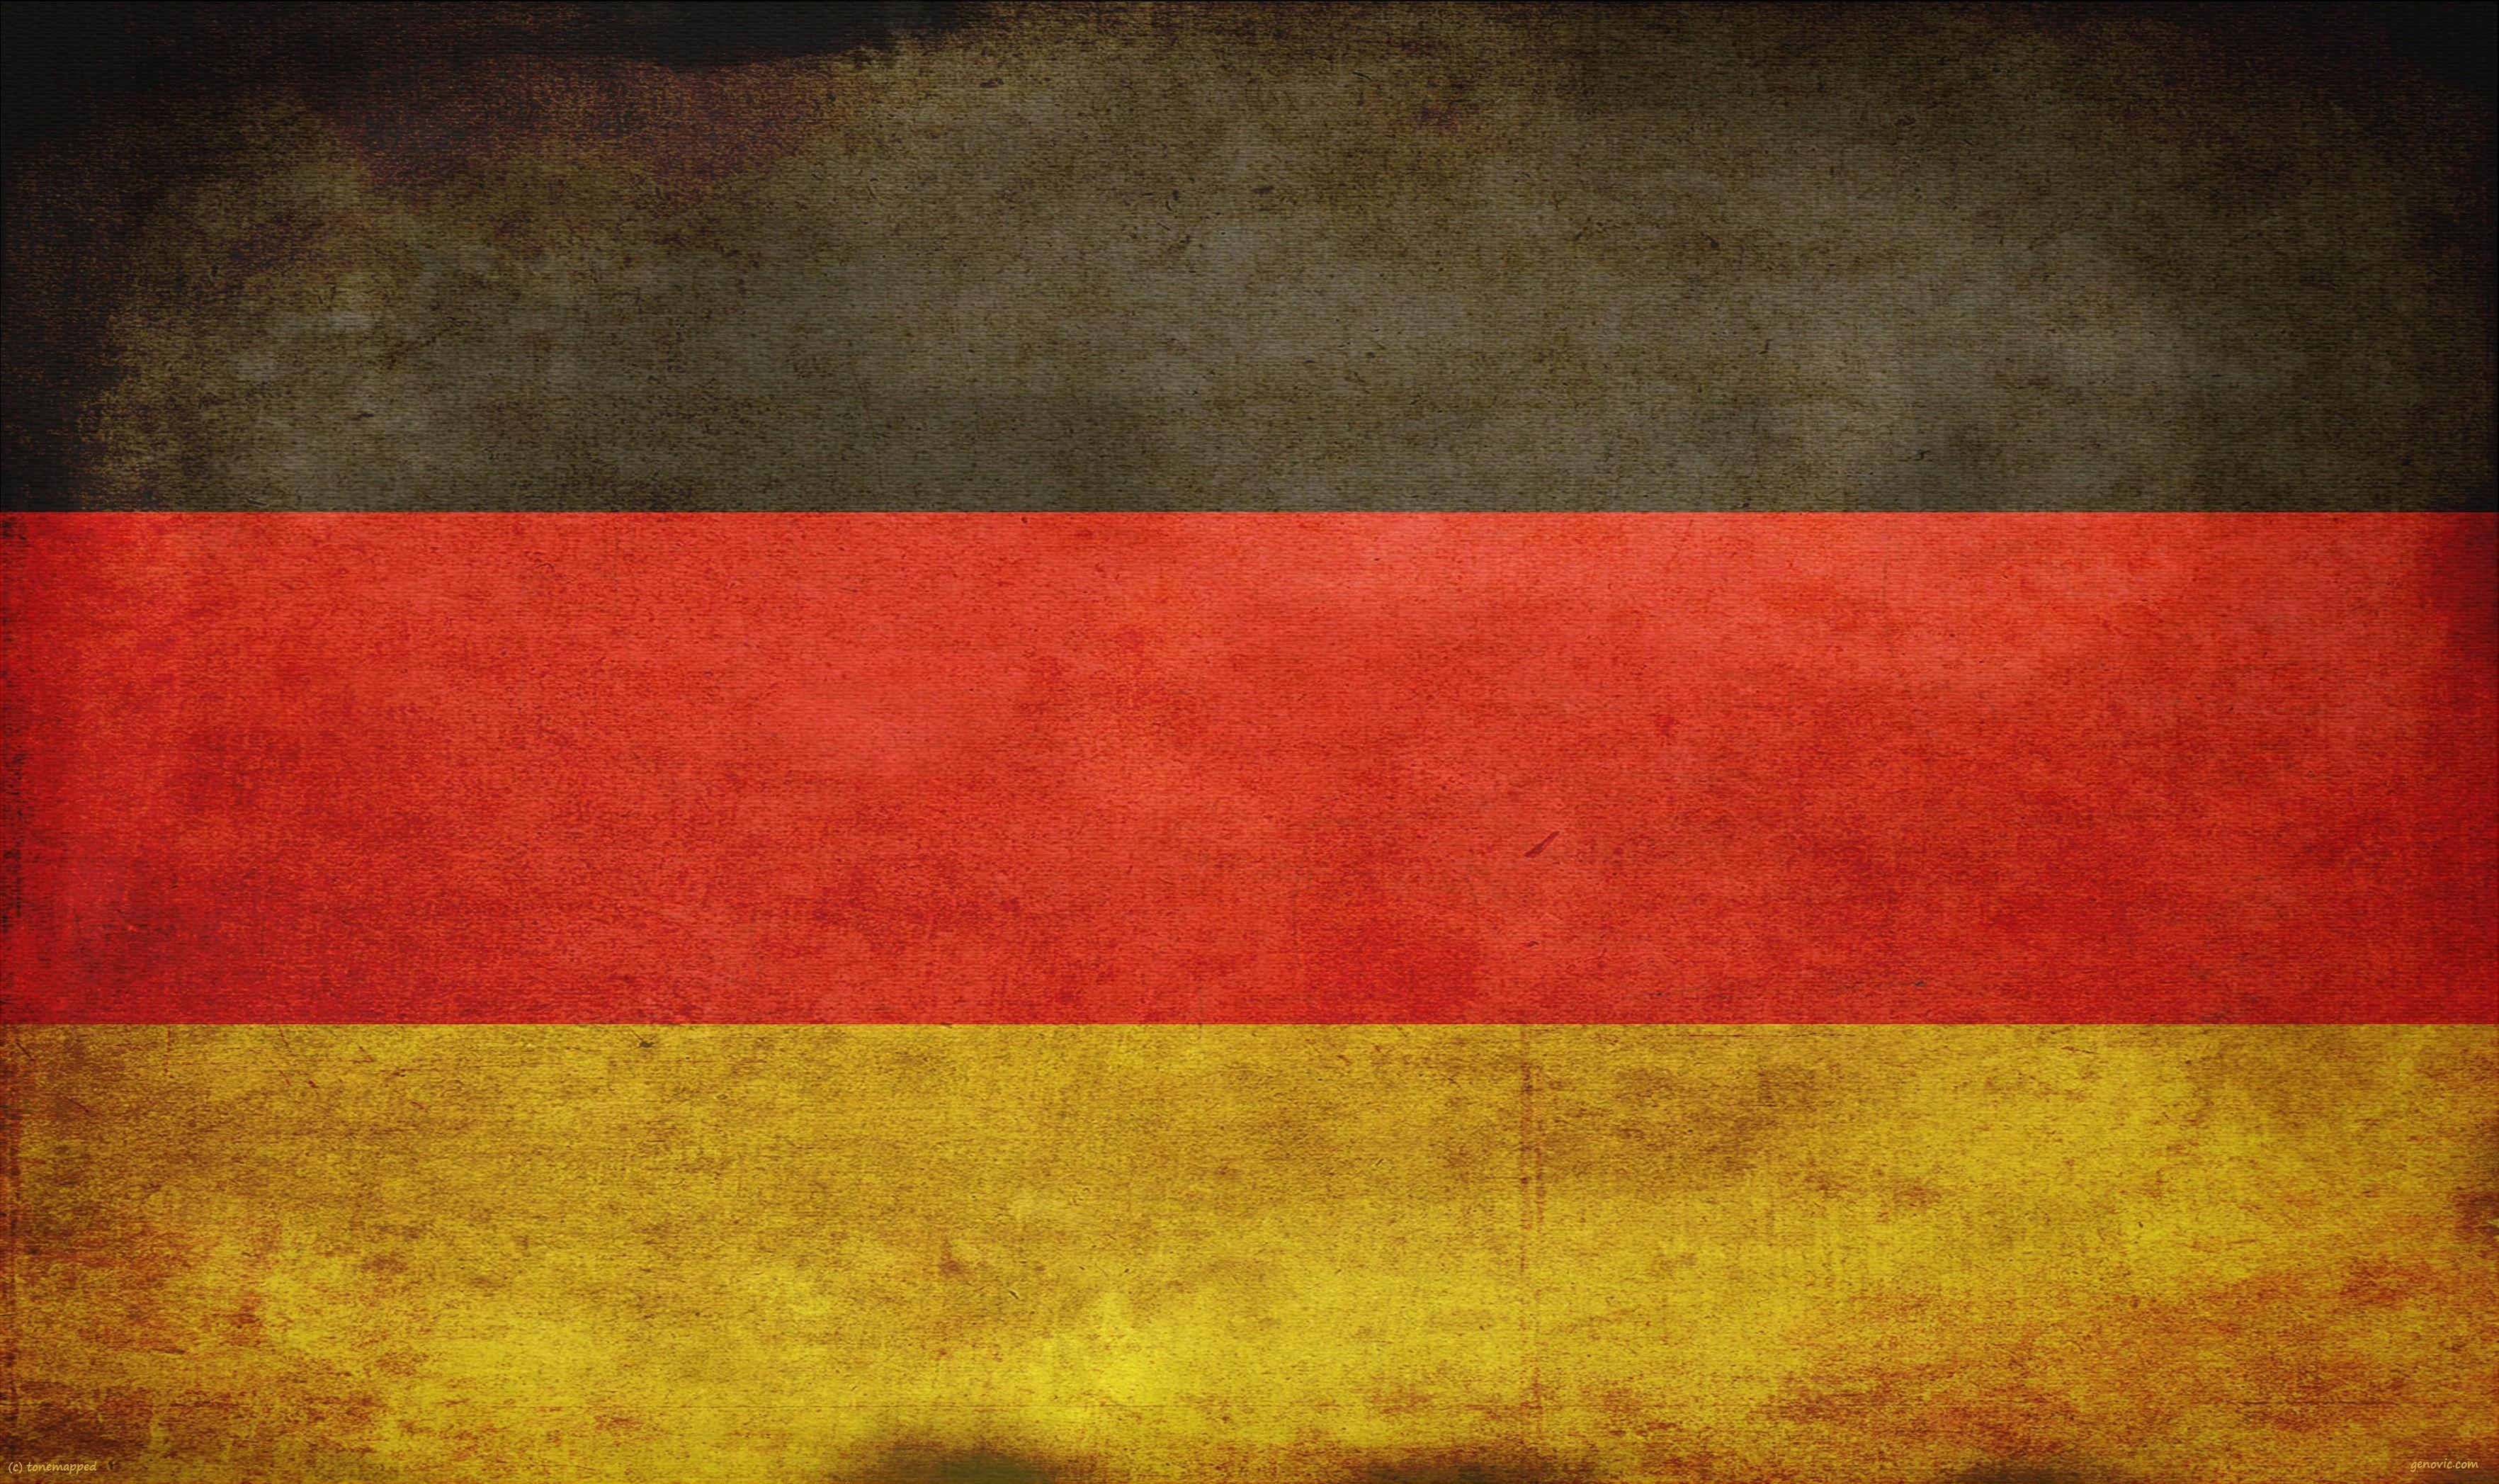 image regarding Printable German Flag named German Flag Wallpapers - Final No cost German Flag Backgrounds